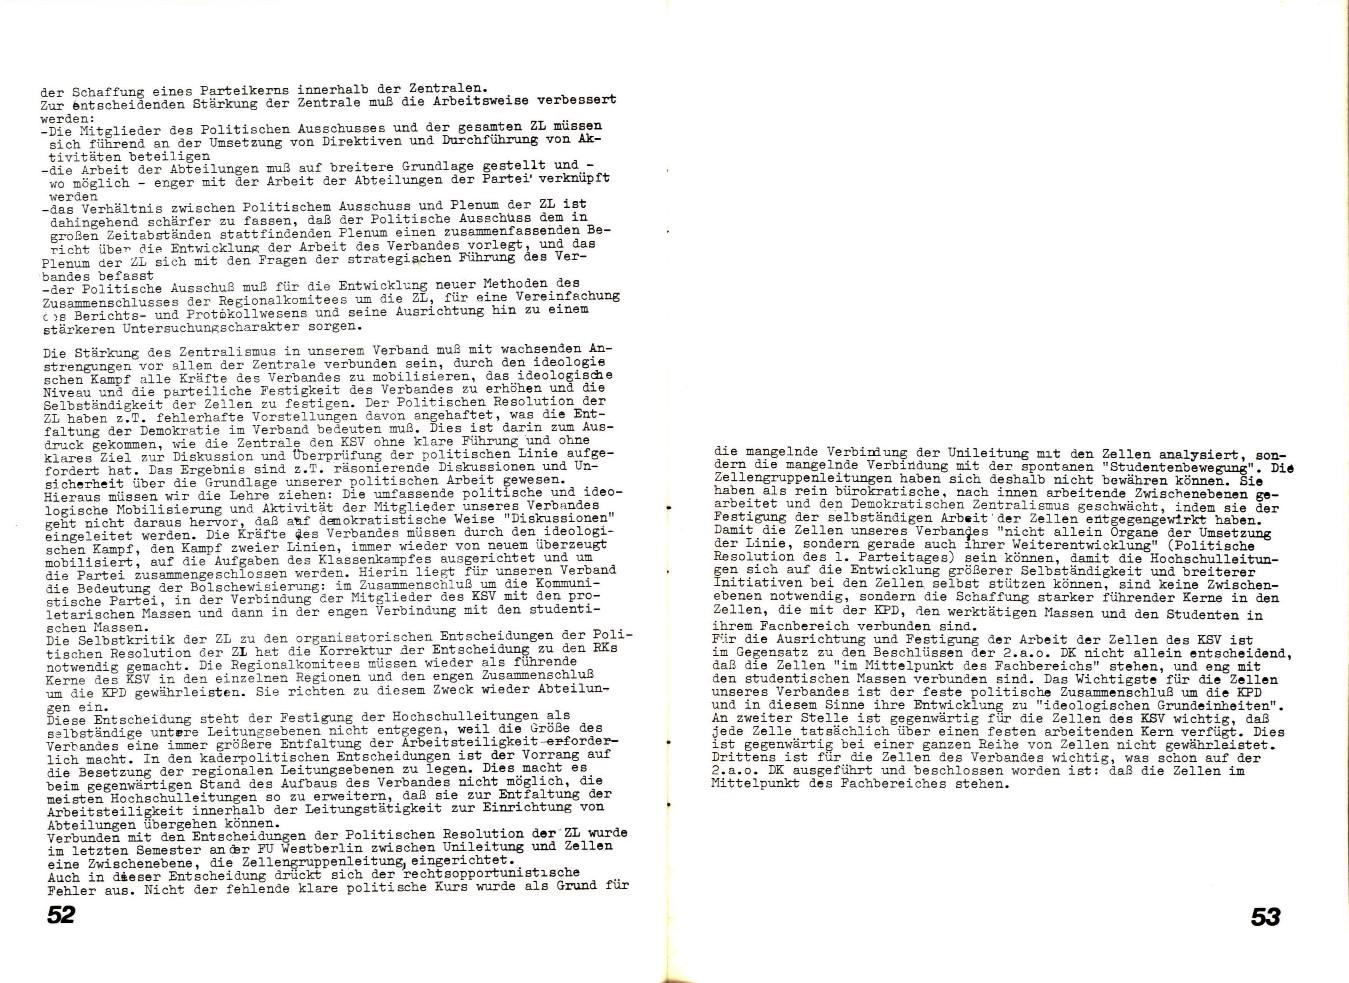 KSV_1974_Rechenschaftsbericht_28